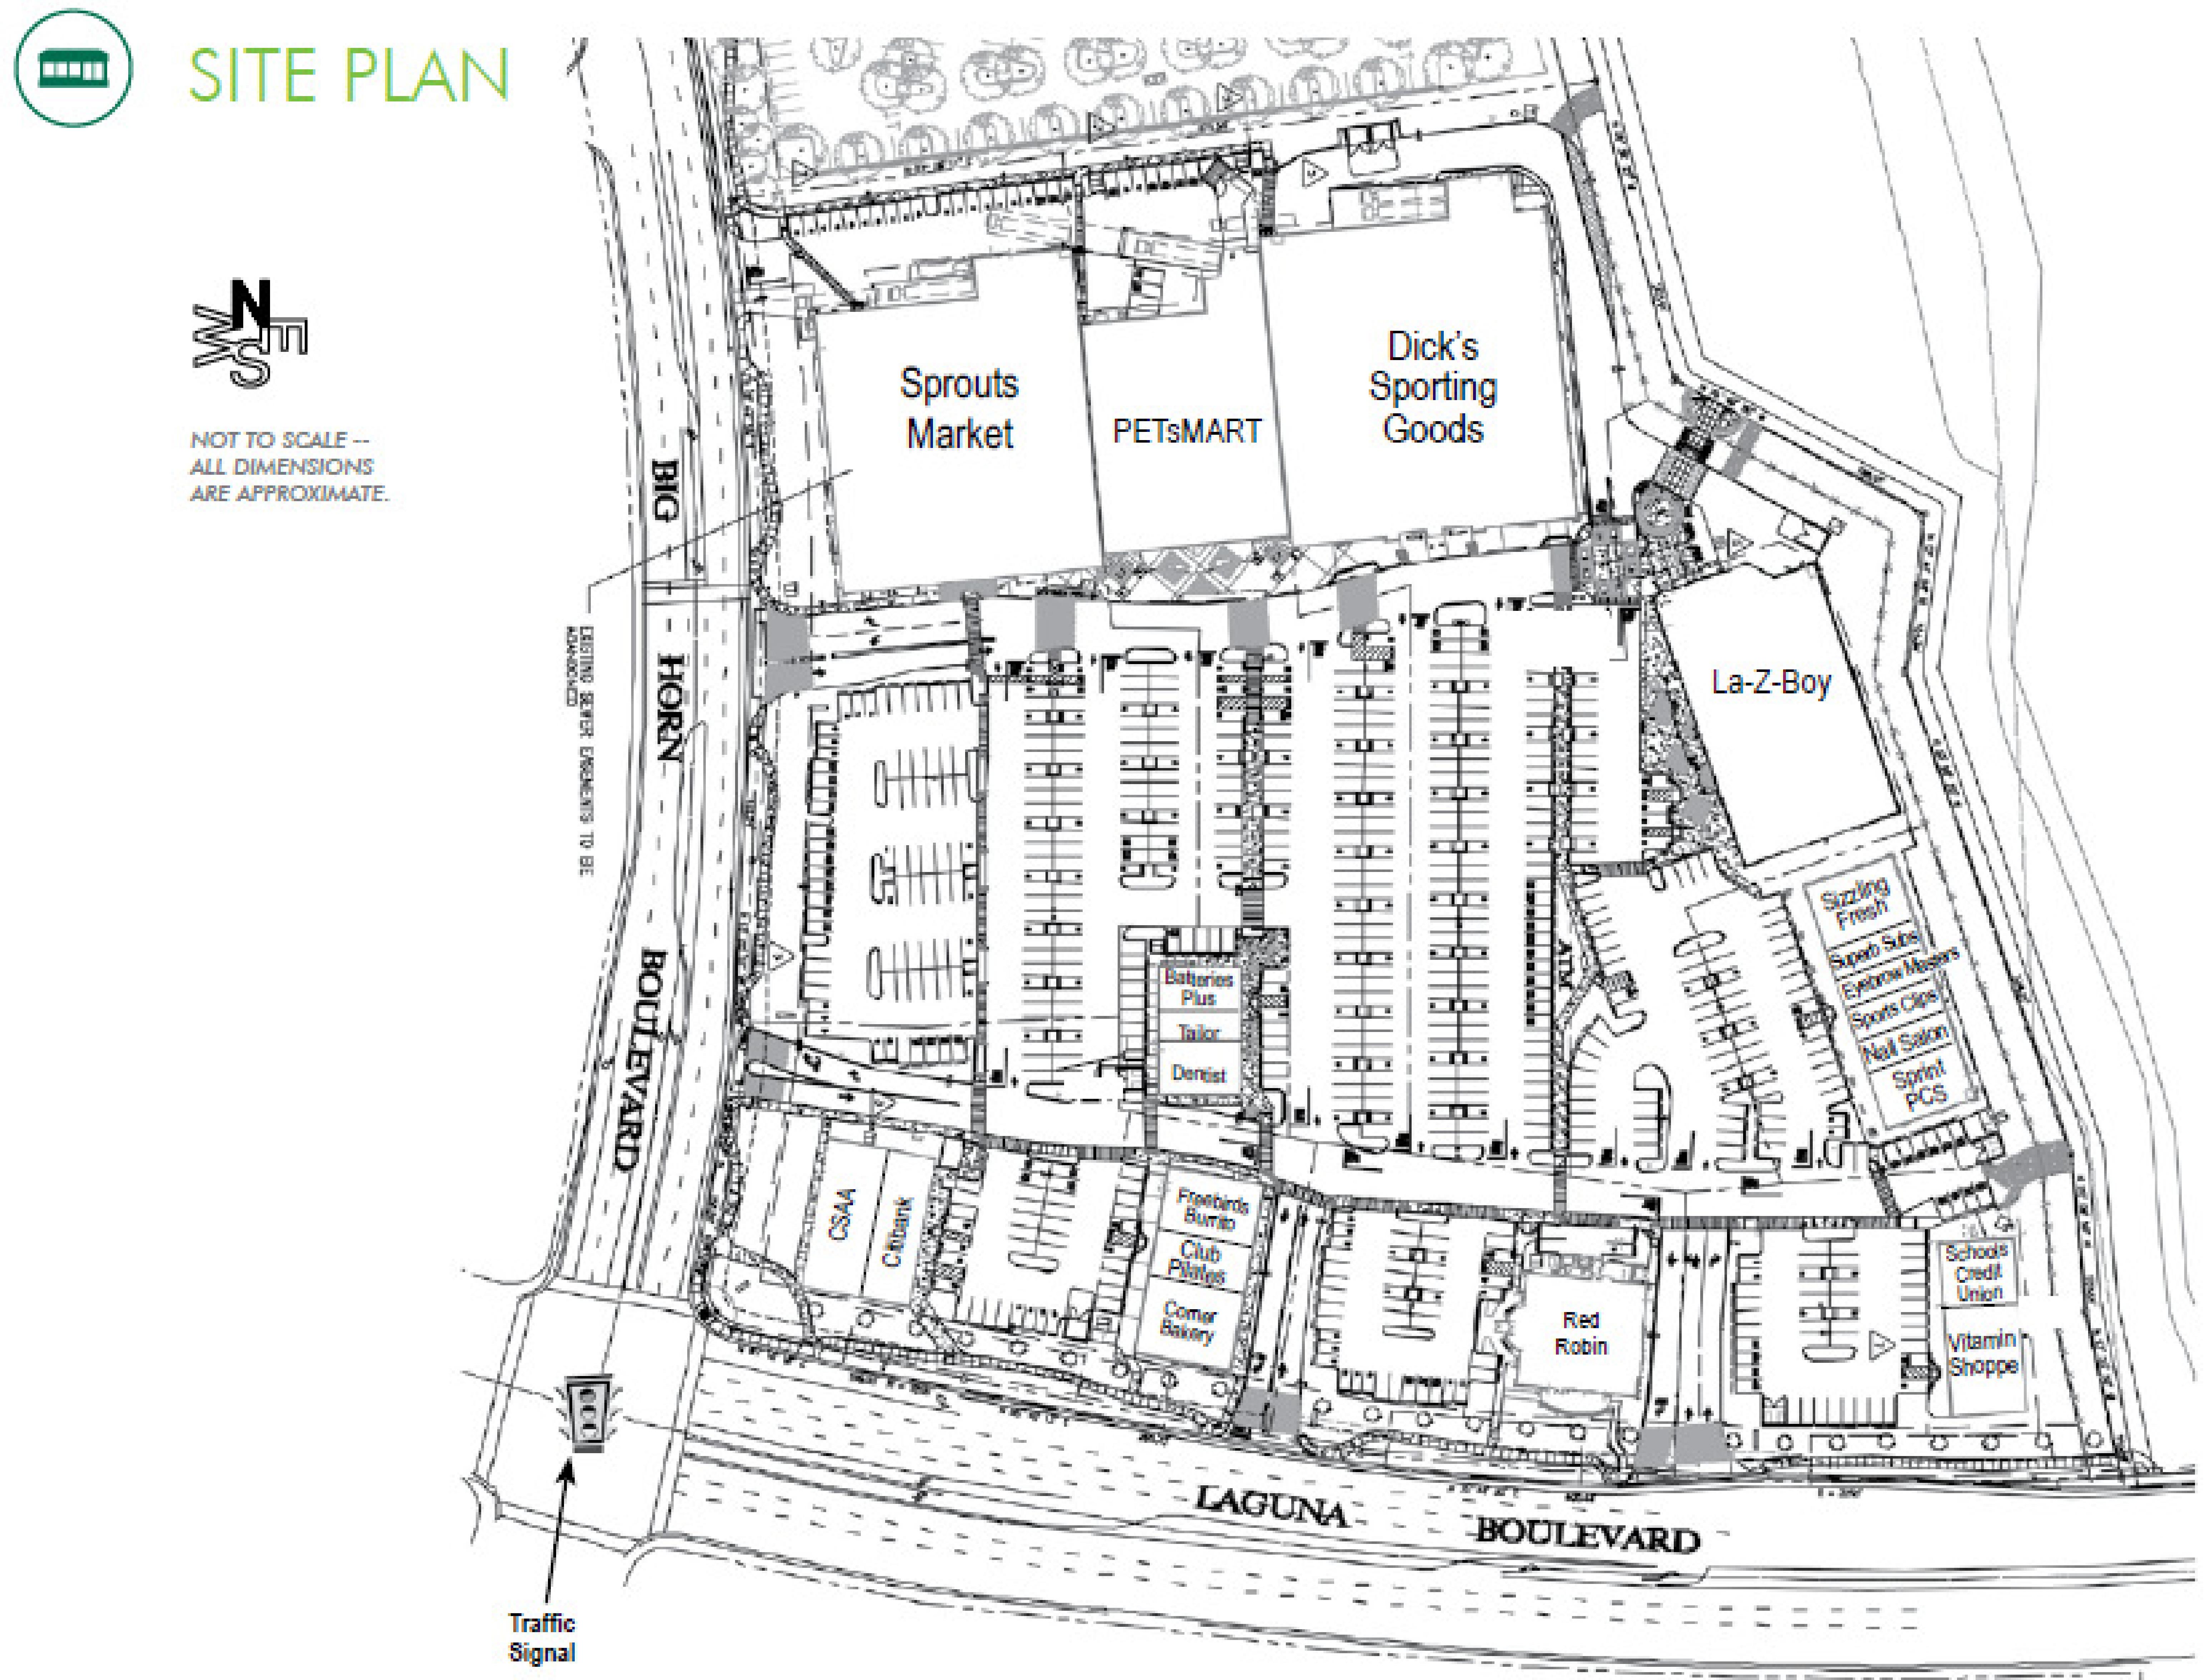 Laguna Gateway Phase II: site plan